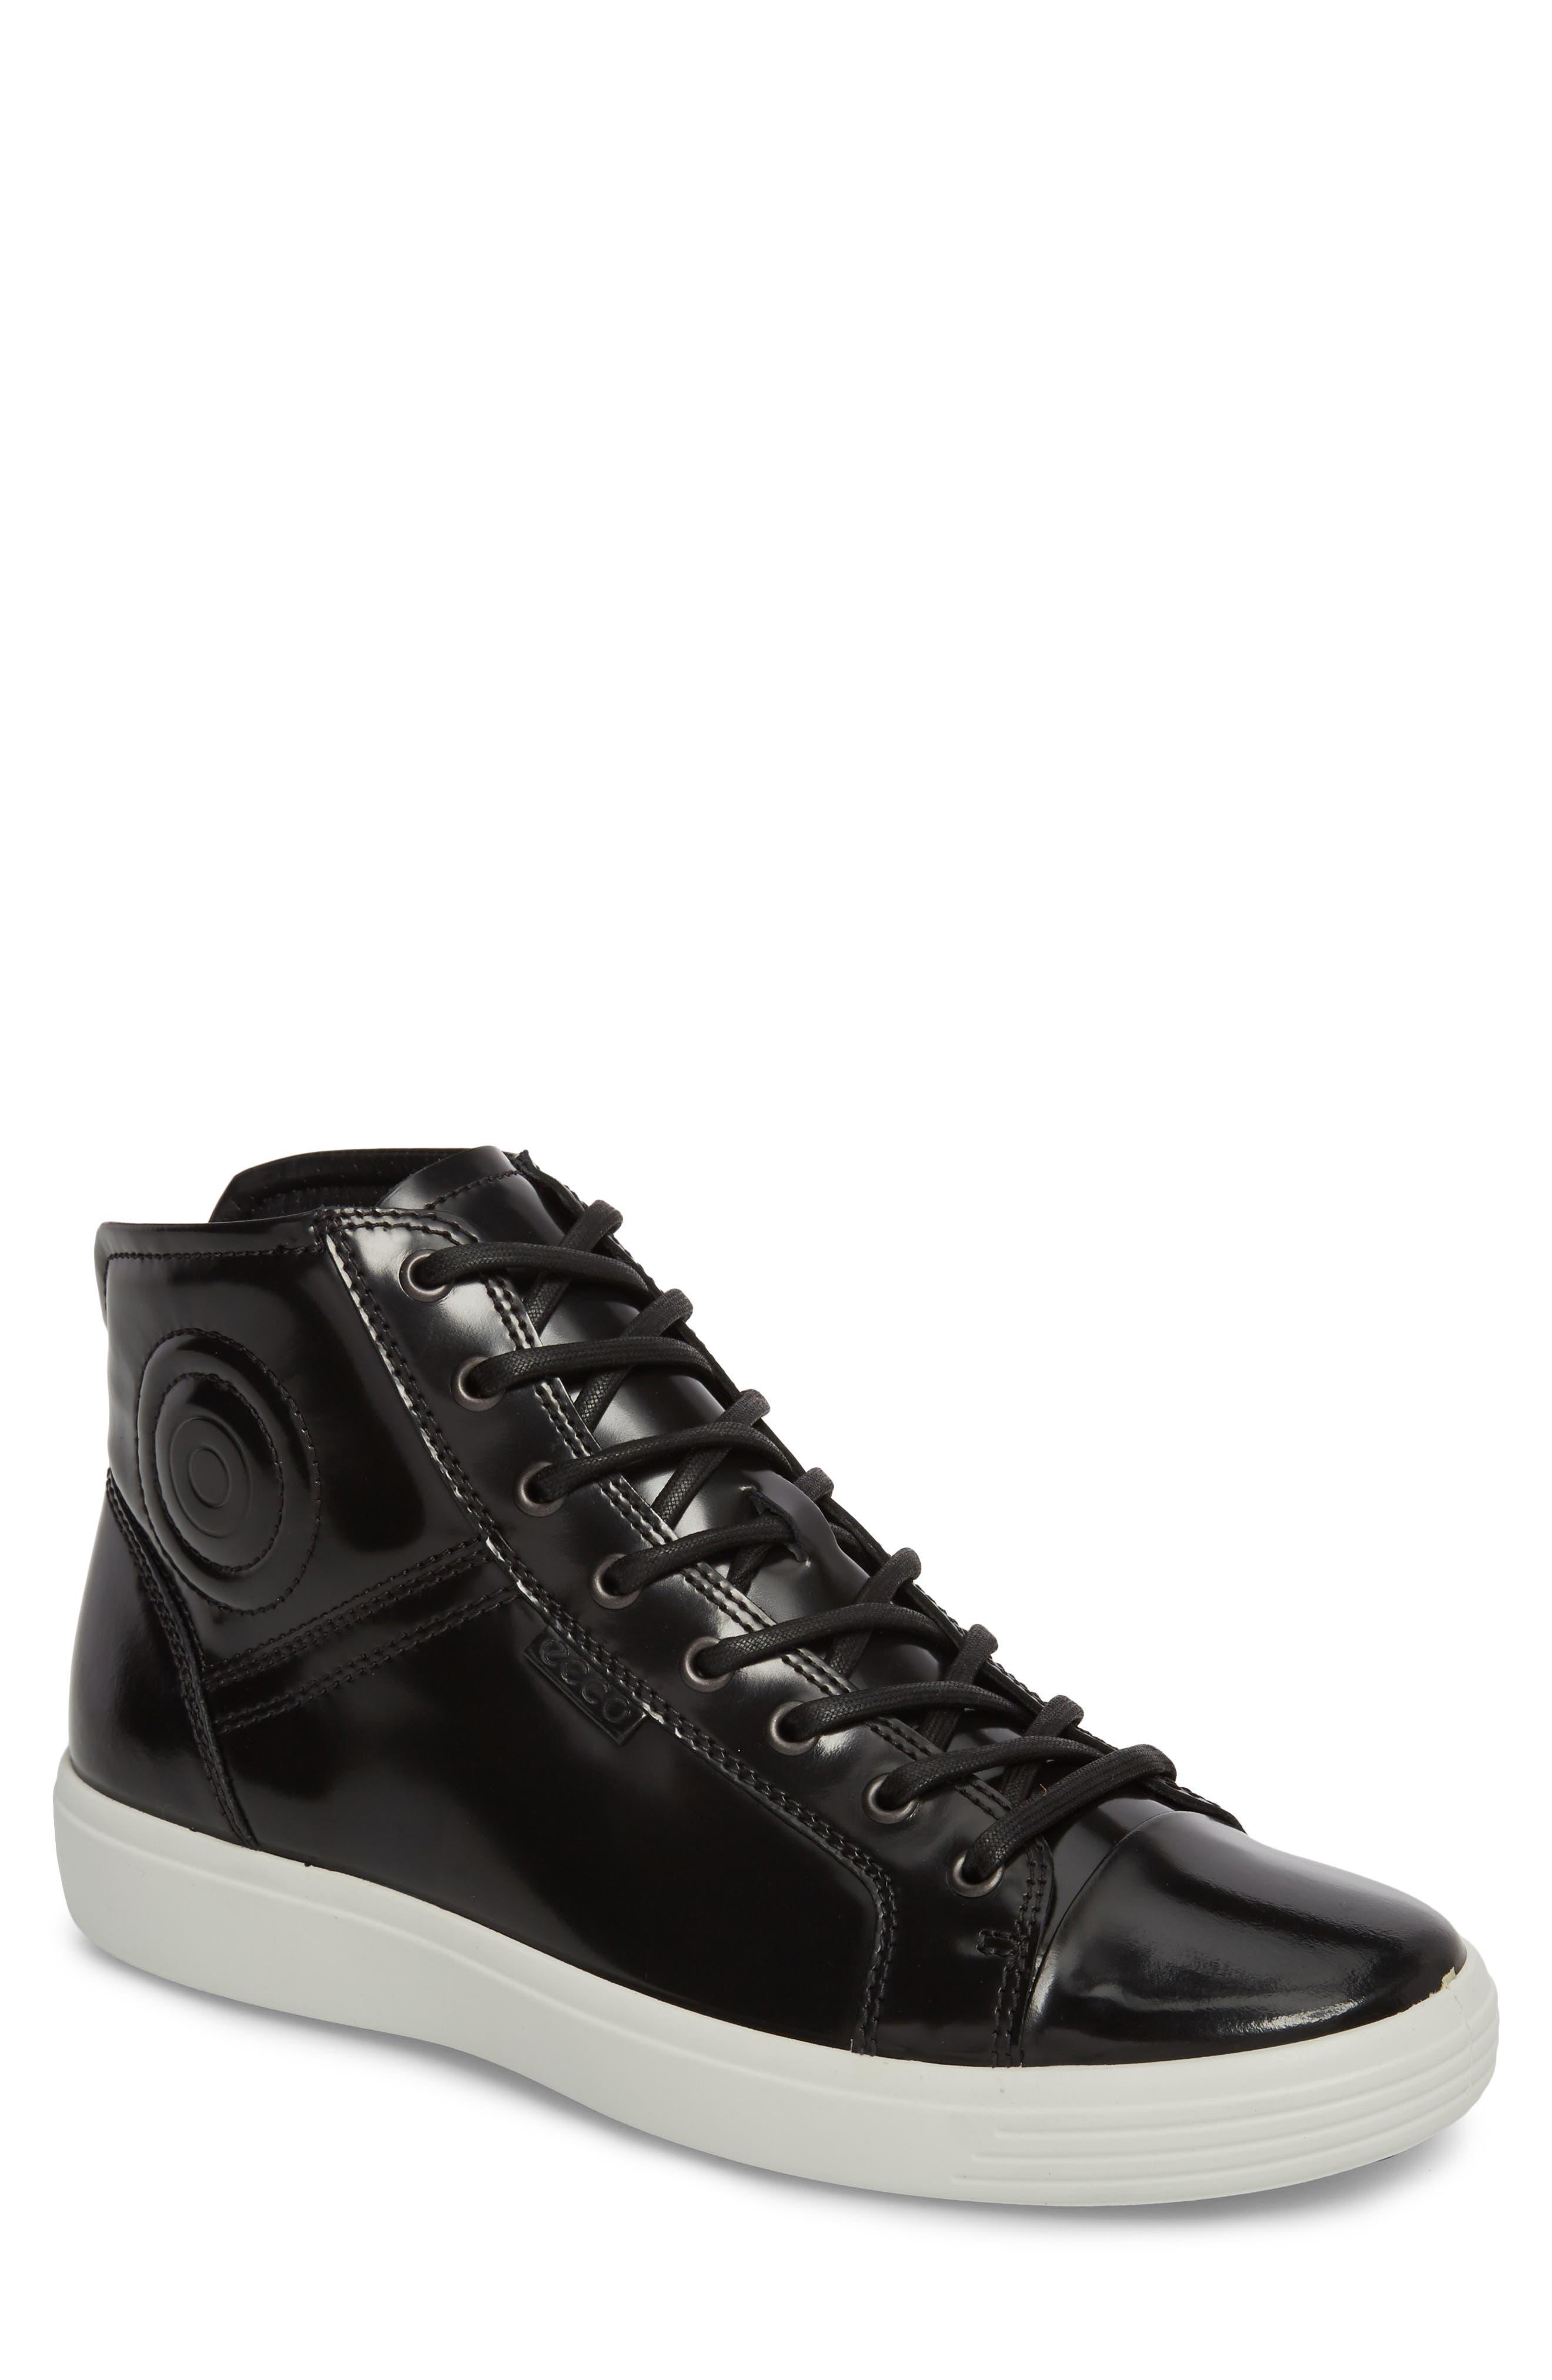 Soft 7 Premium High Top Sneaker,                         Main,                         color, 009